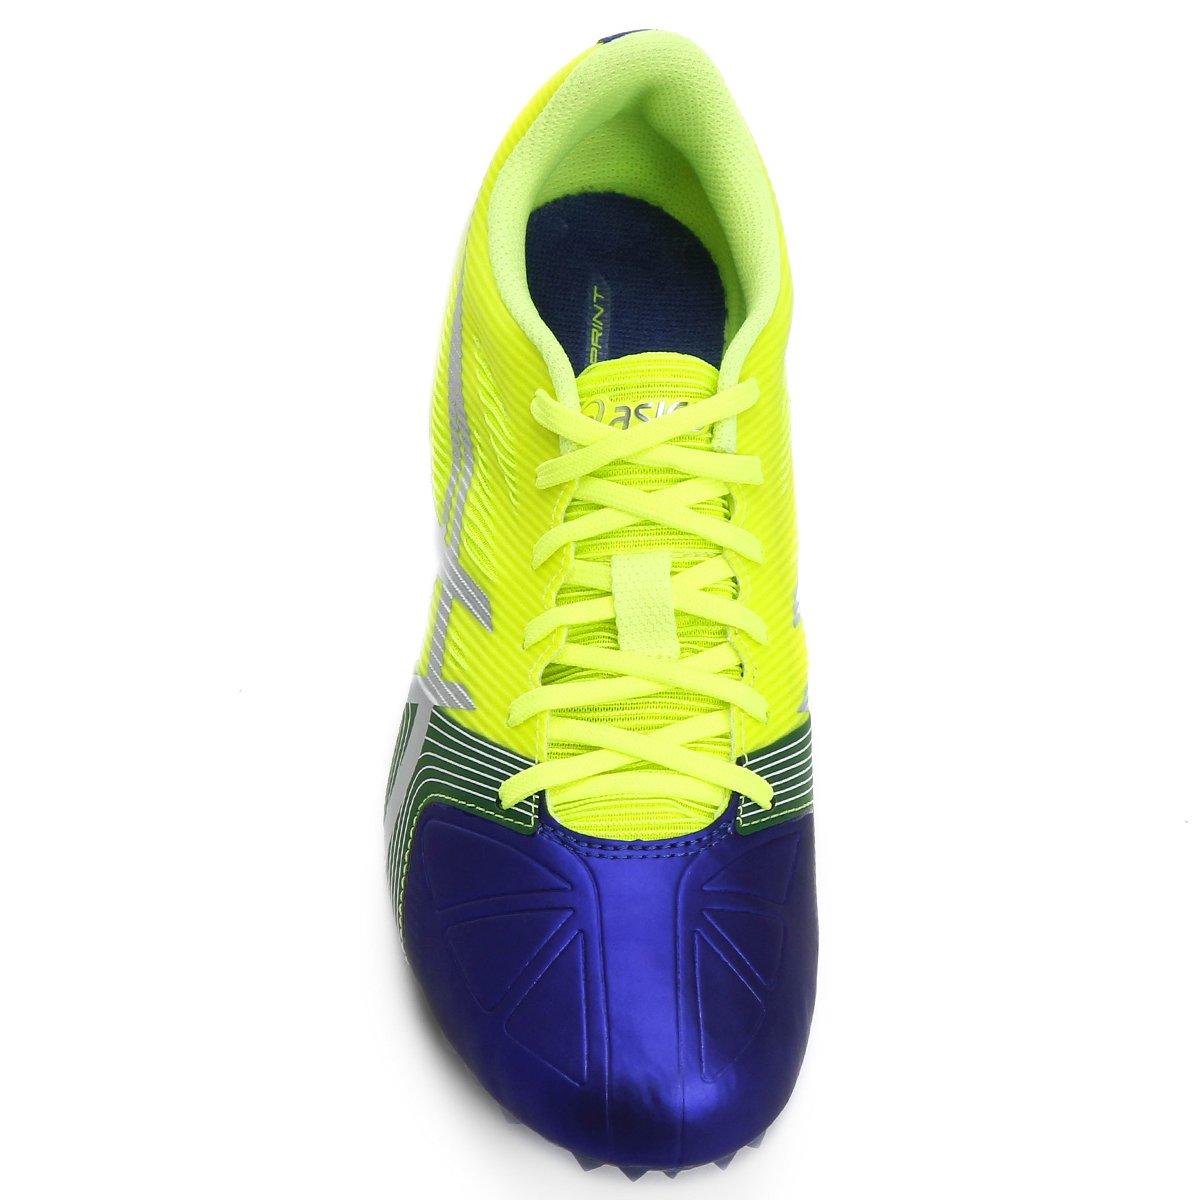 Masculino Asics Hypersprint Limão Verde e Sapatilha Azul 6 Sapatilha Asics XCqwa